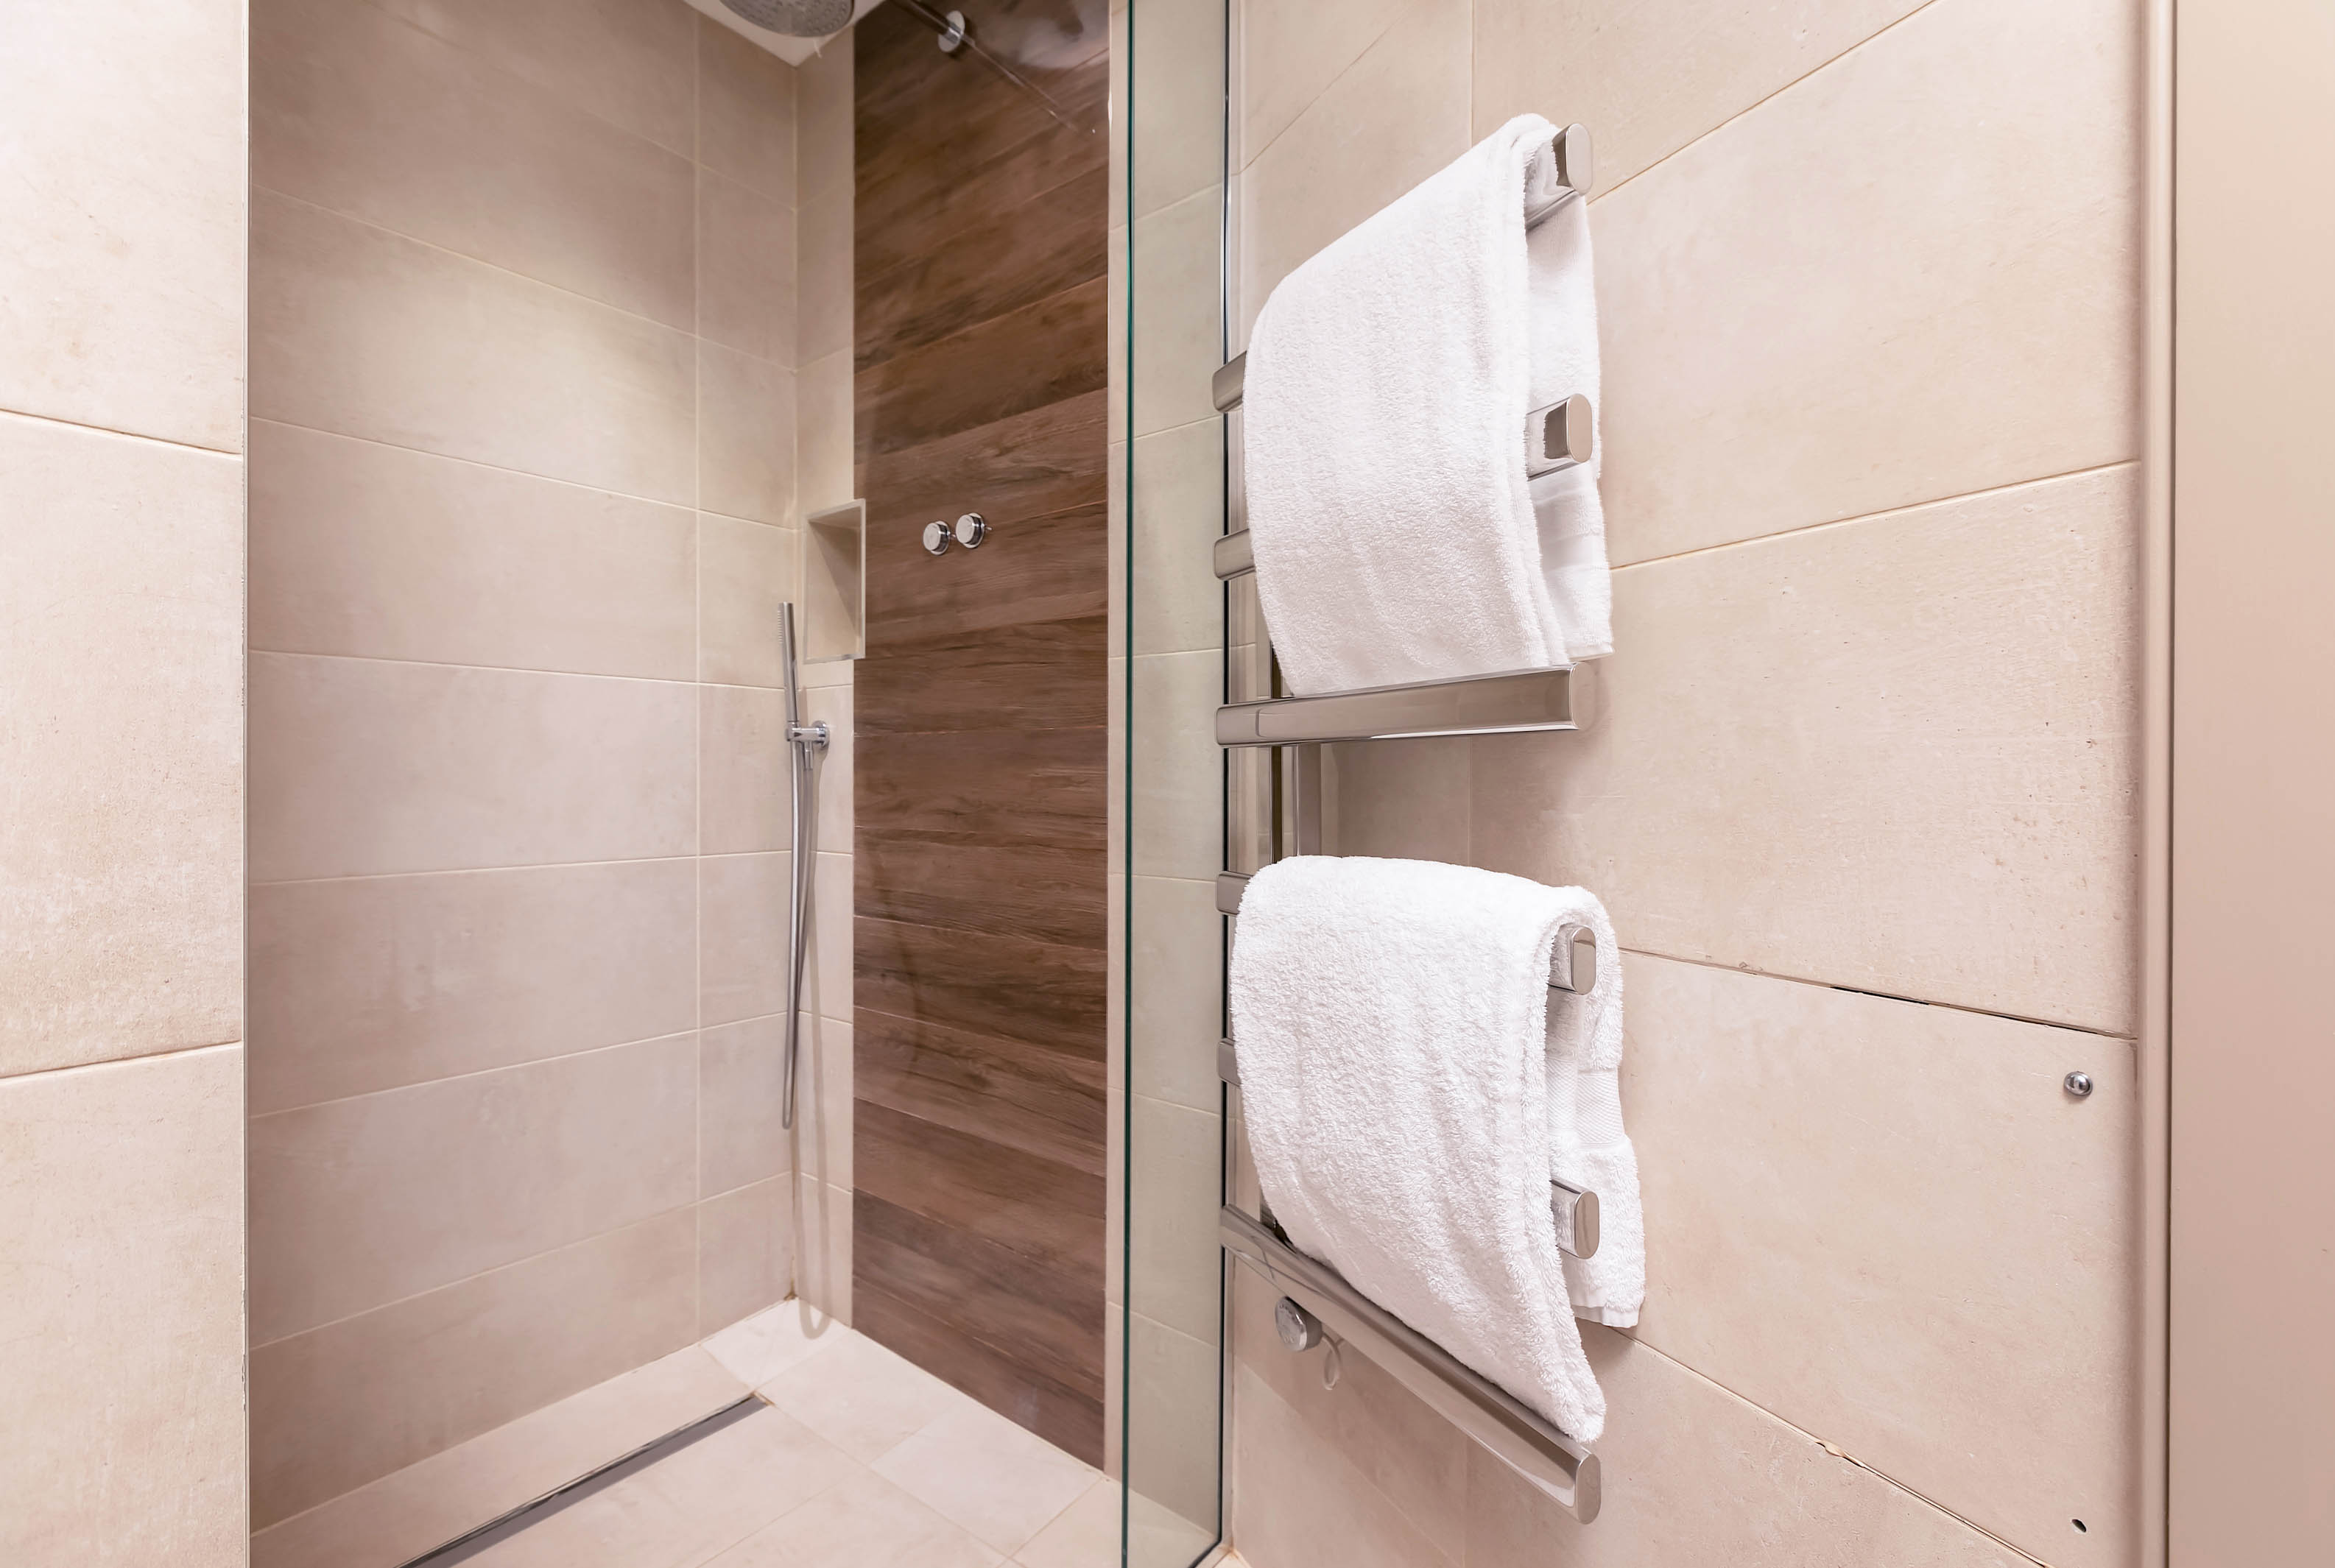 Lovelydays luxury service apartment rental - London - Fitzrovia - Wells Mews B - Lovelysuite - 2 bedrooms - 2 bathrooms - Lovely shower - 2831f3f2708f - Lovelydays